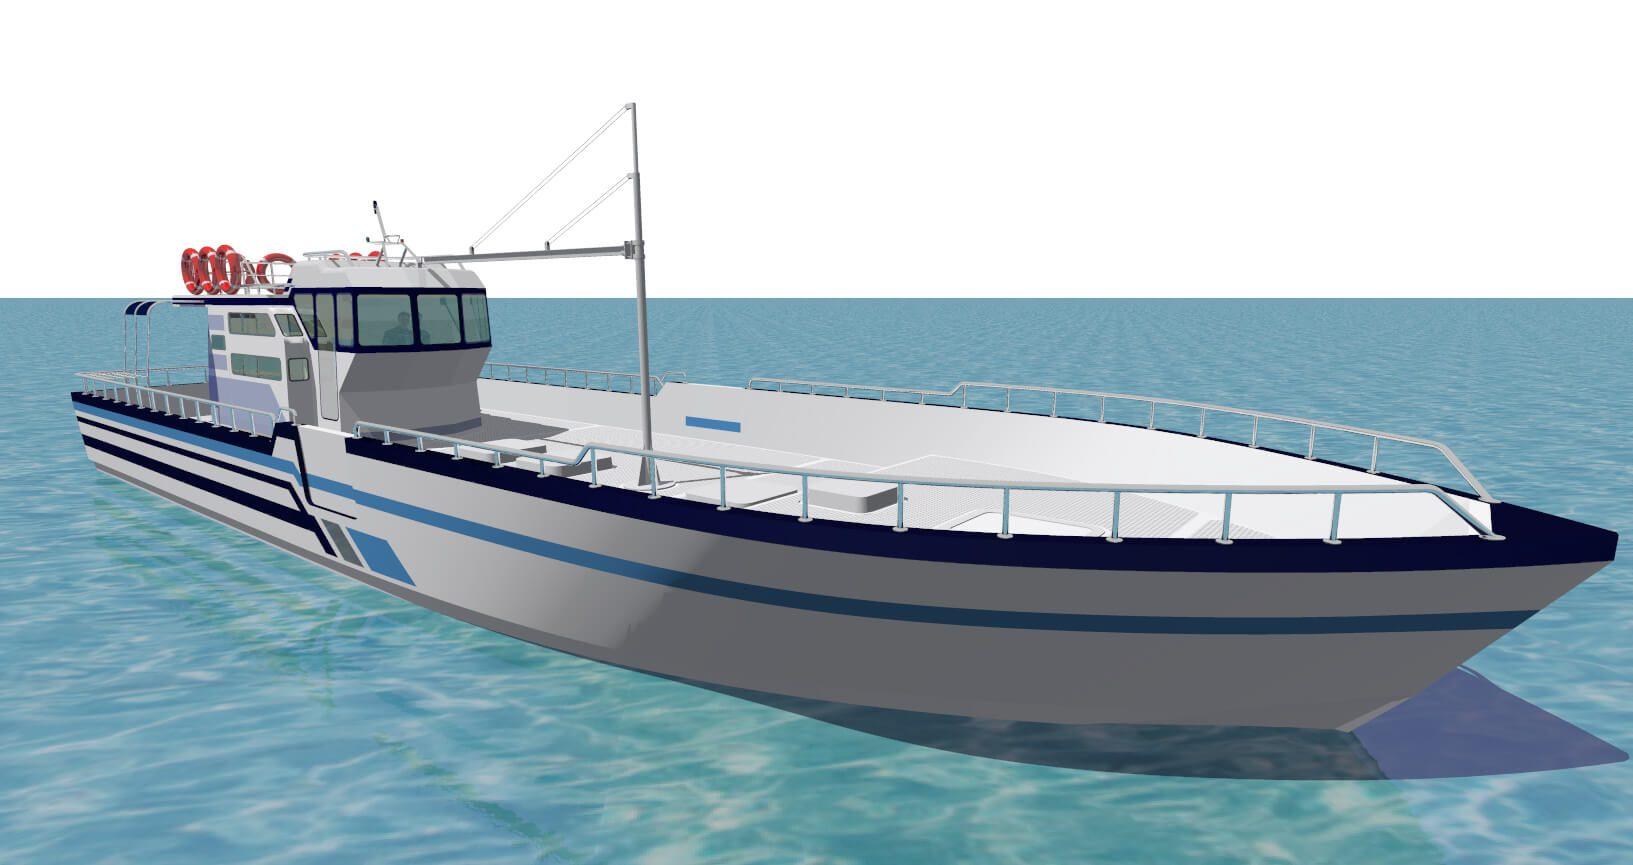 Fishing-vessle-1